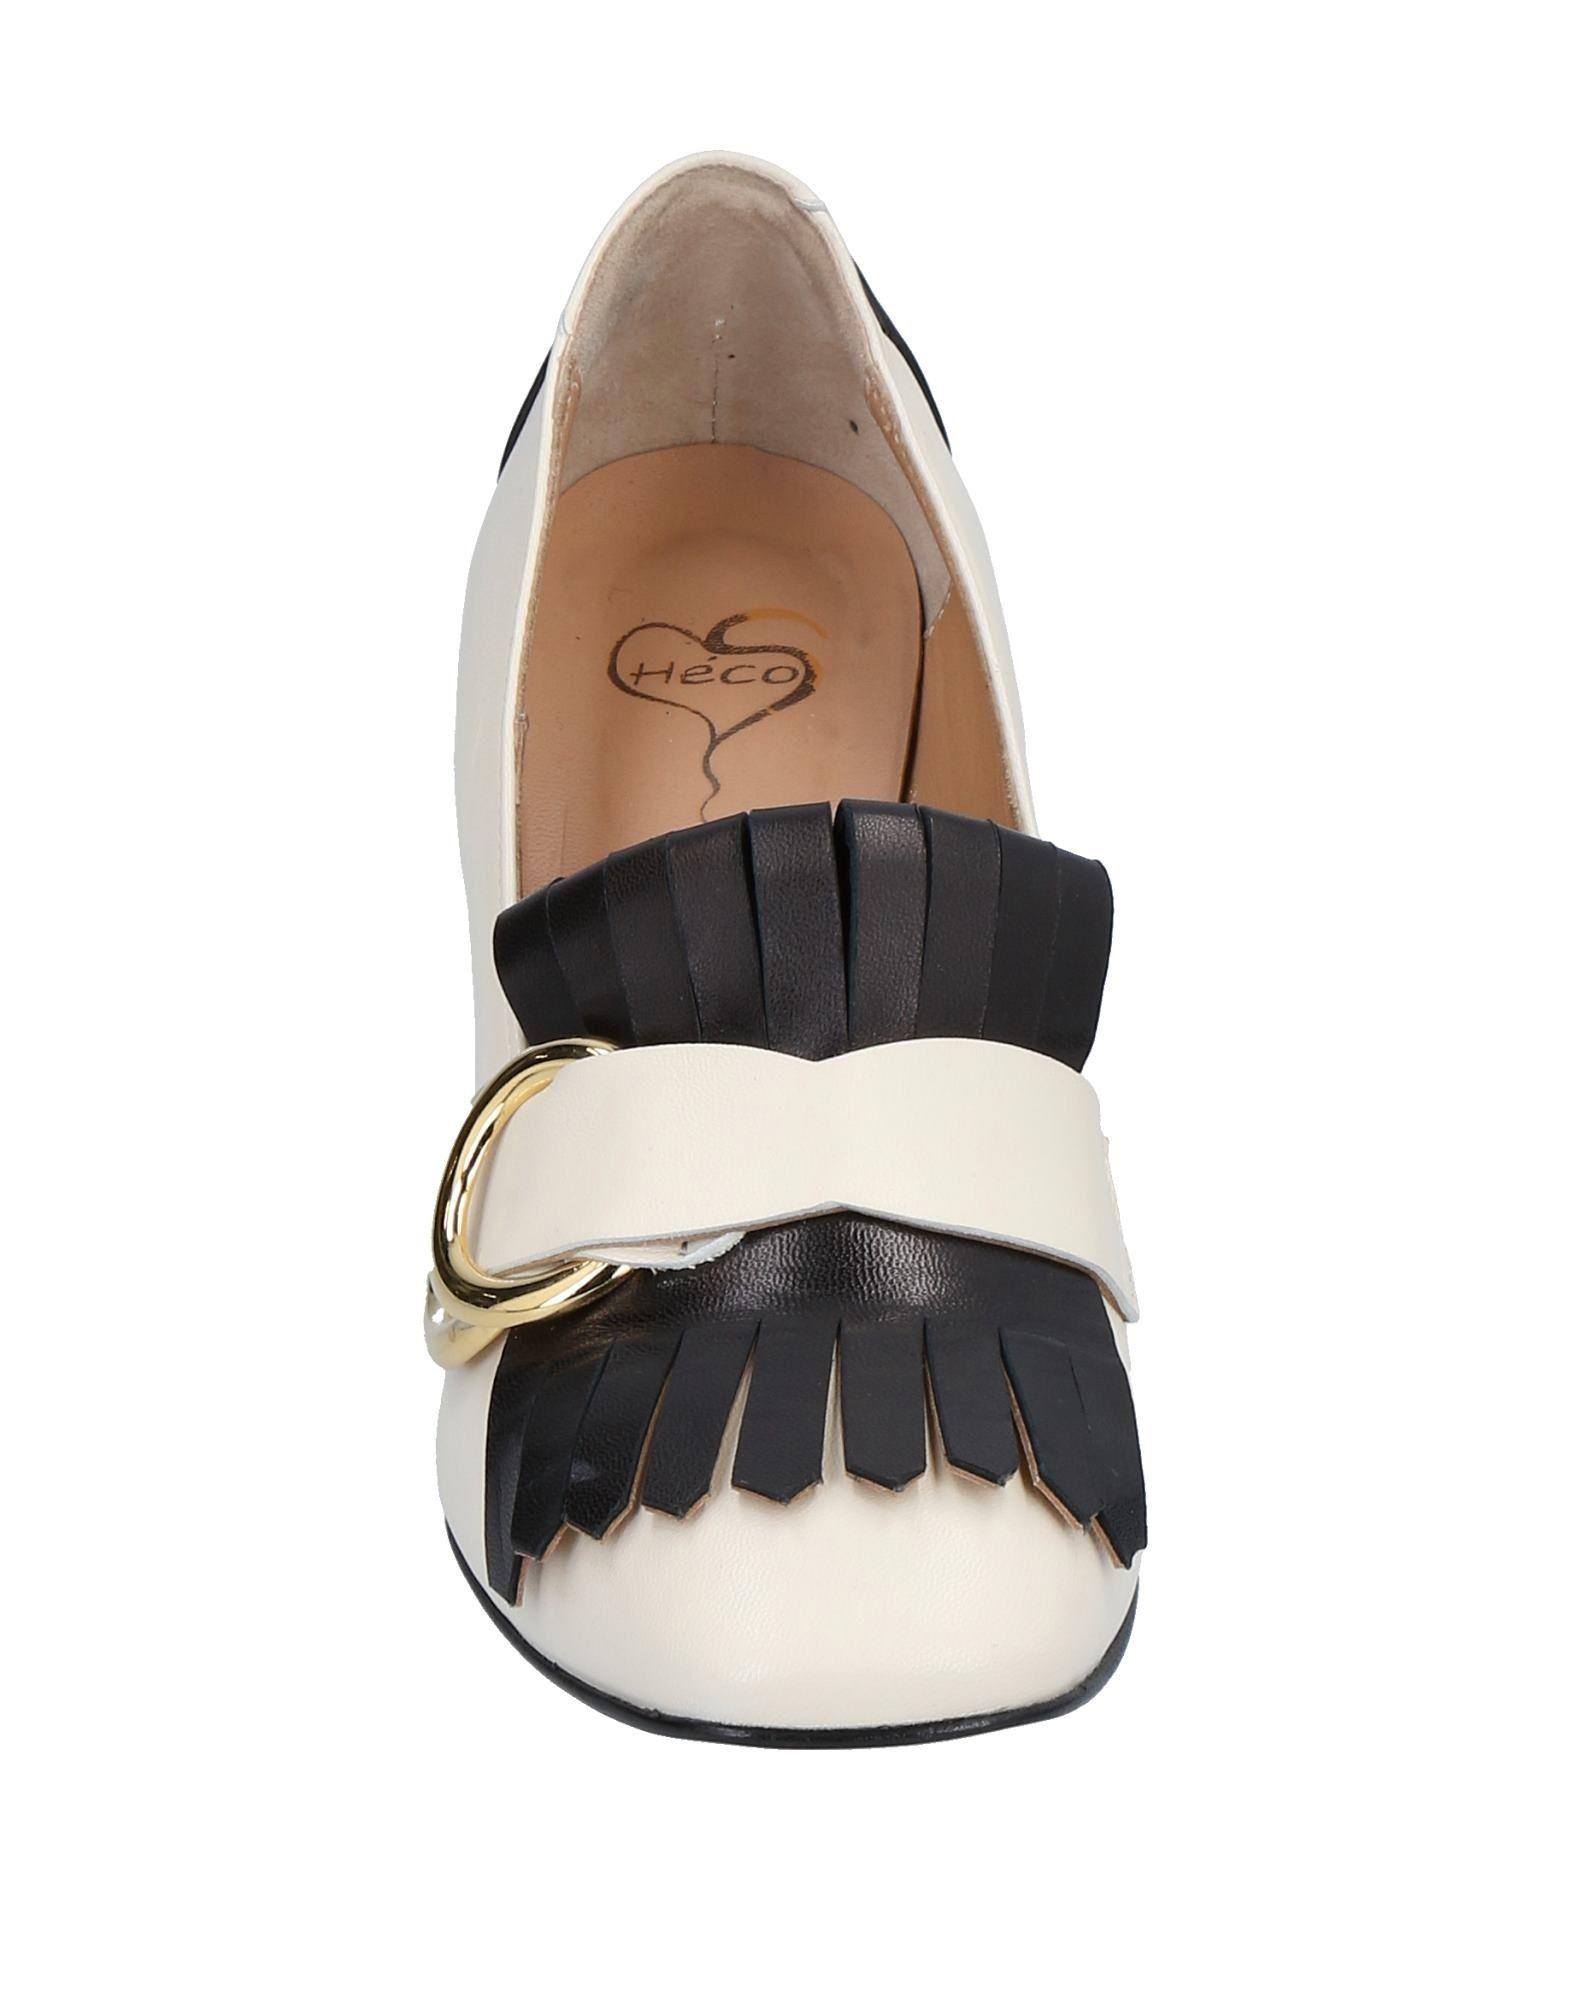 Stilvolle Damen billige Schuhe Hécos Mokassins Damen Stilvolle  11521726UB 256bdc